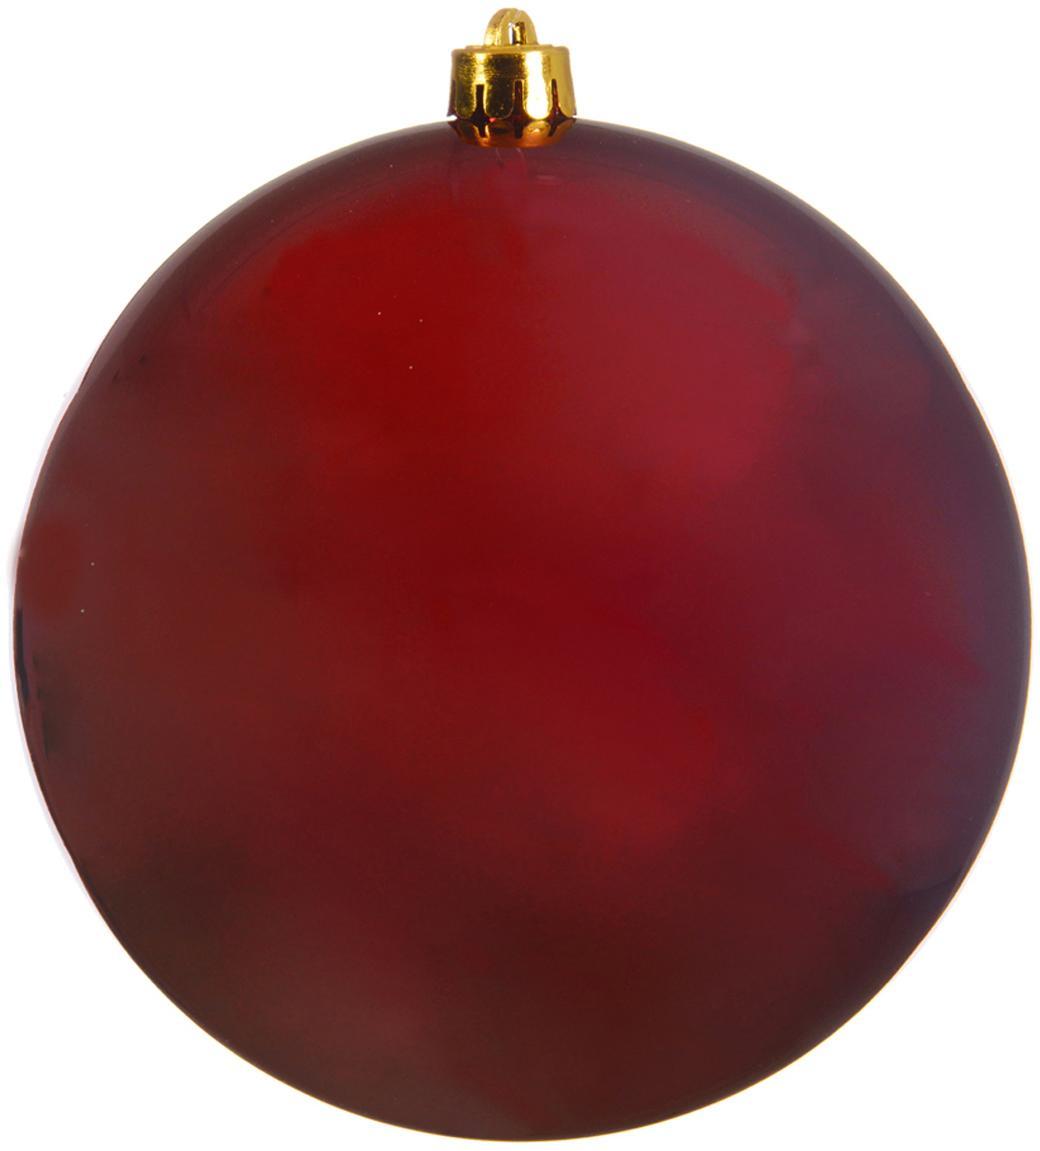 XL Weihnachtskugel Minstix Ø20cm, Kunststoff, Rot, Ø 20 cm